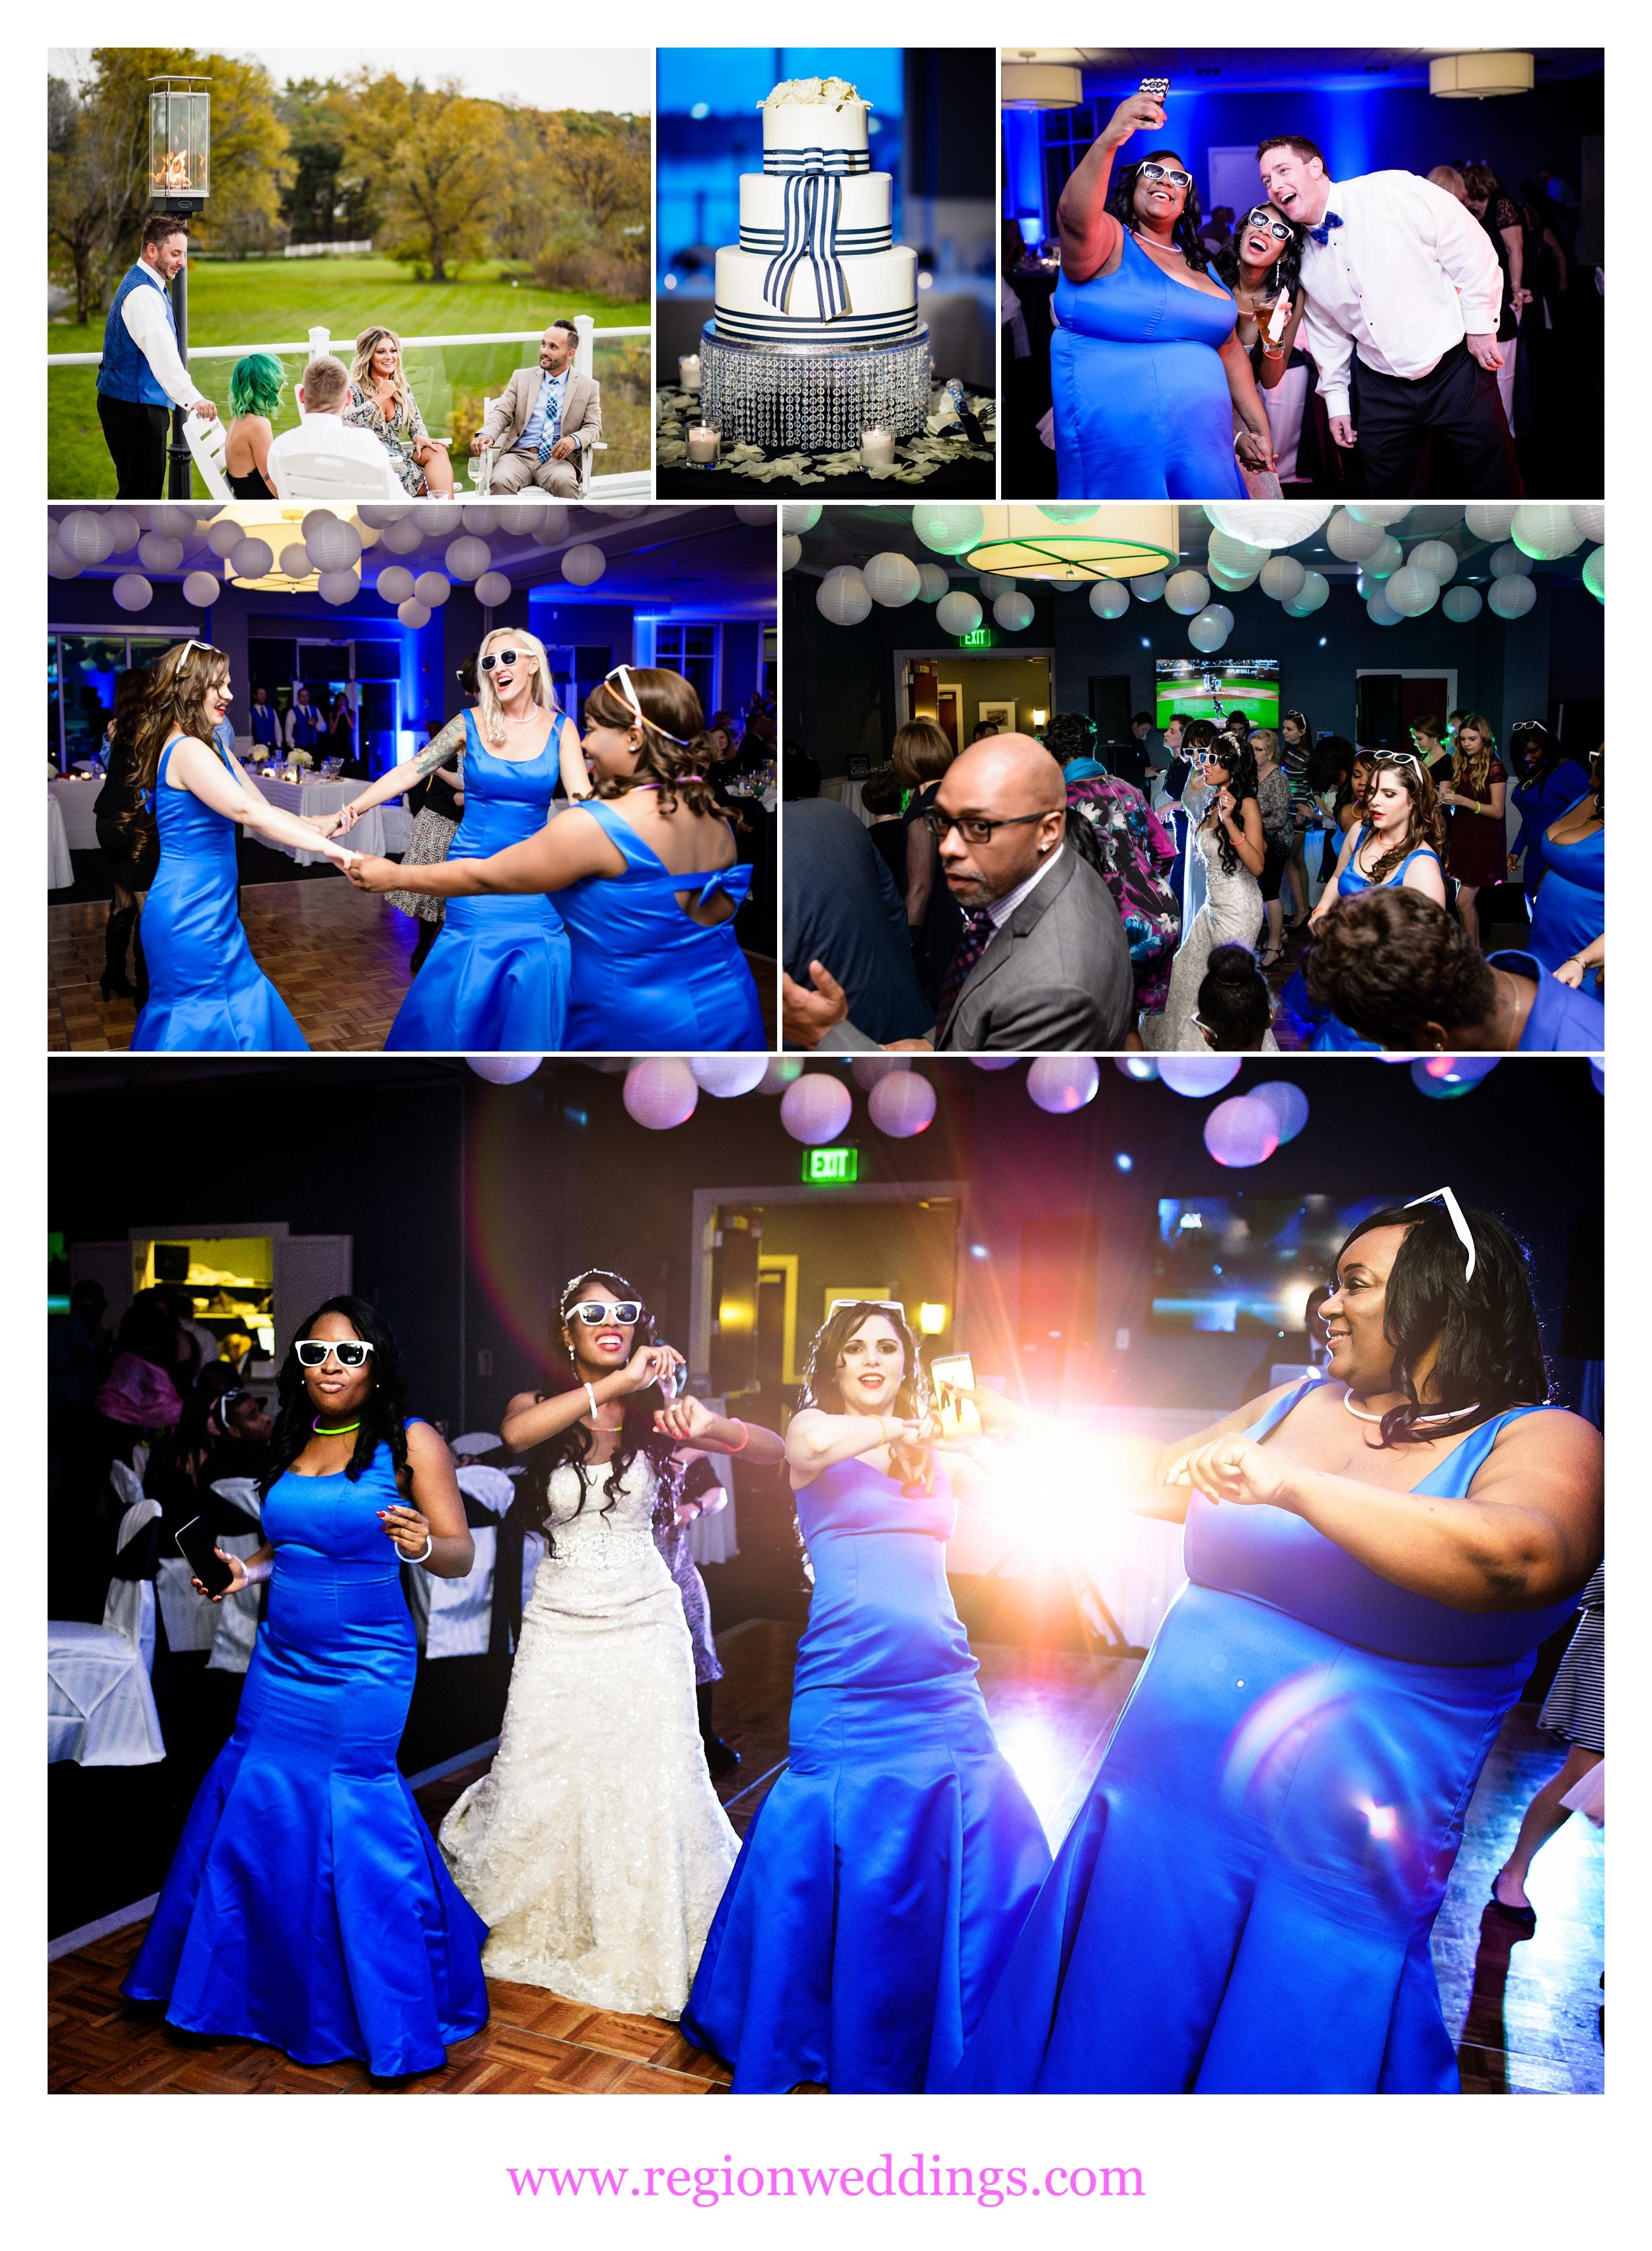 Wedding reception celebration at Lighthouse Restaurant in Cedar Lake, Indiana.